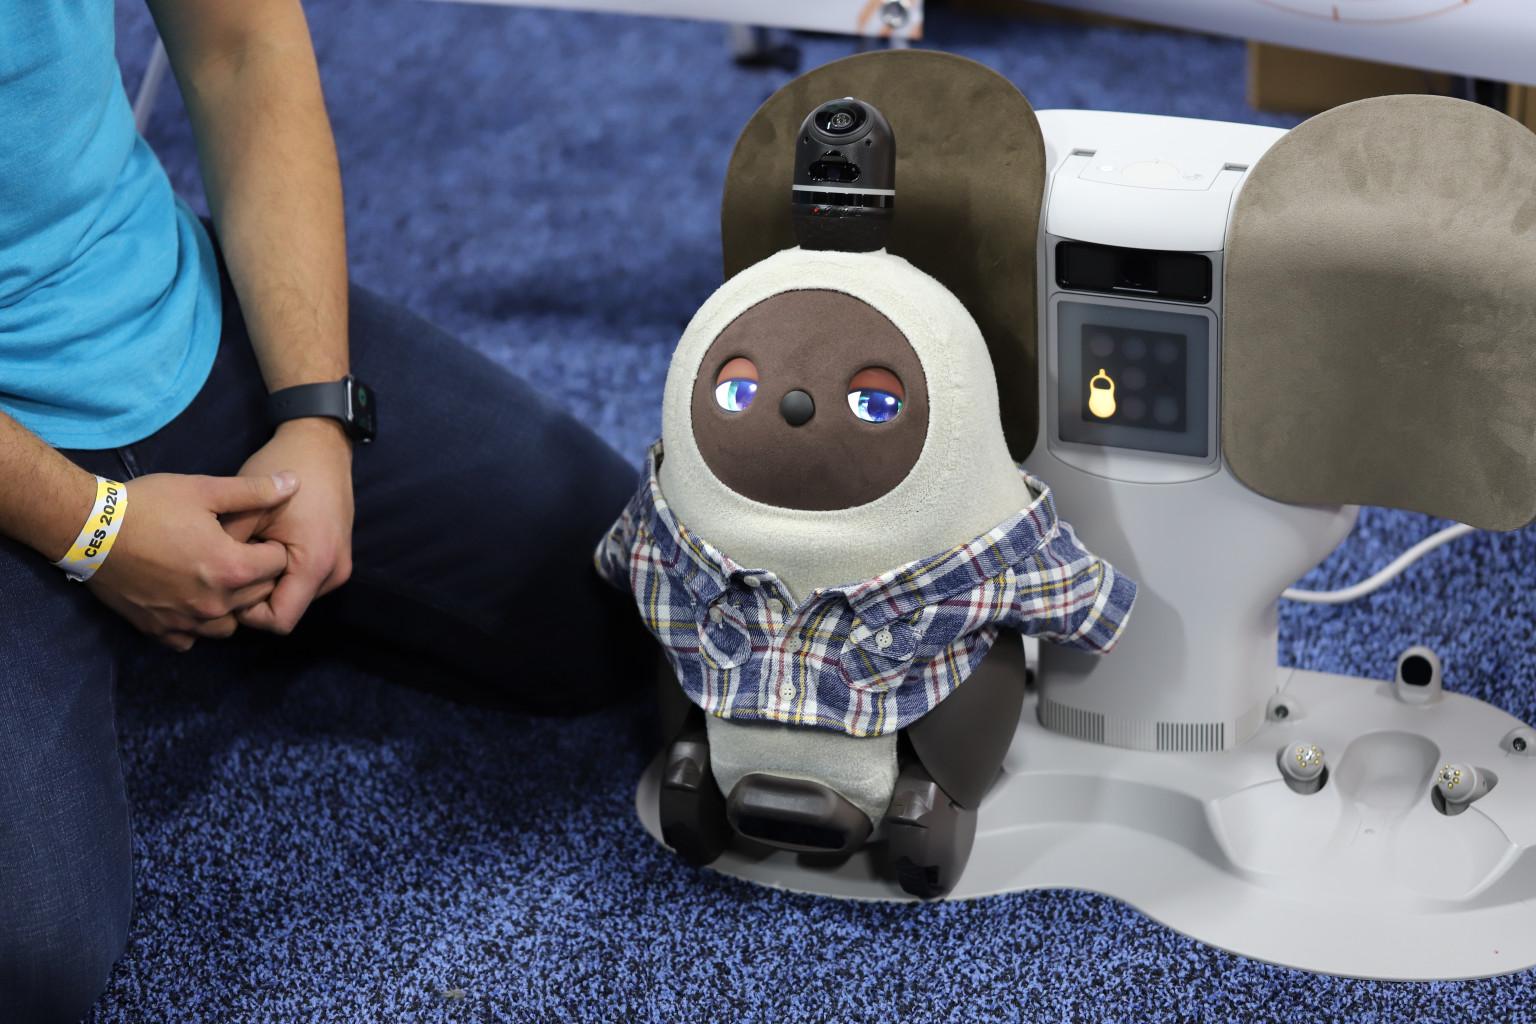 Lovot-robots